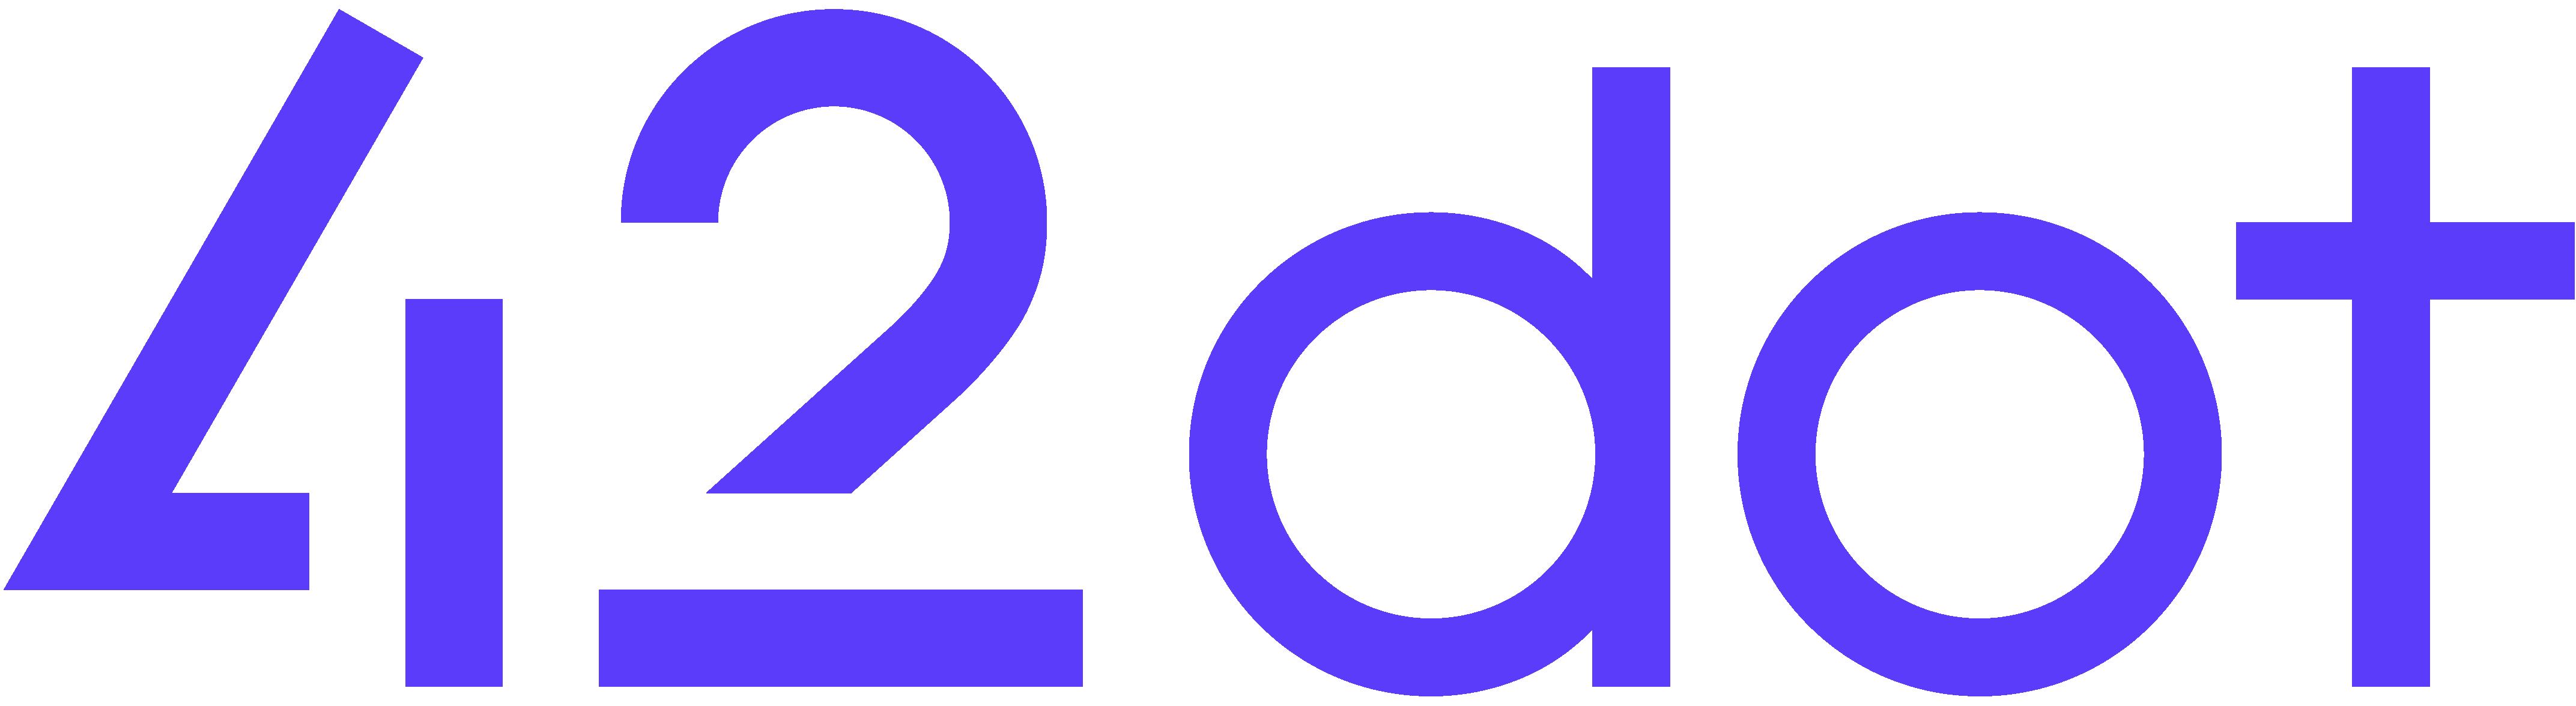 42dot logo